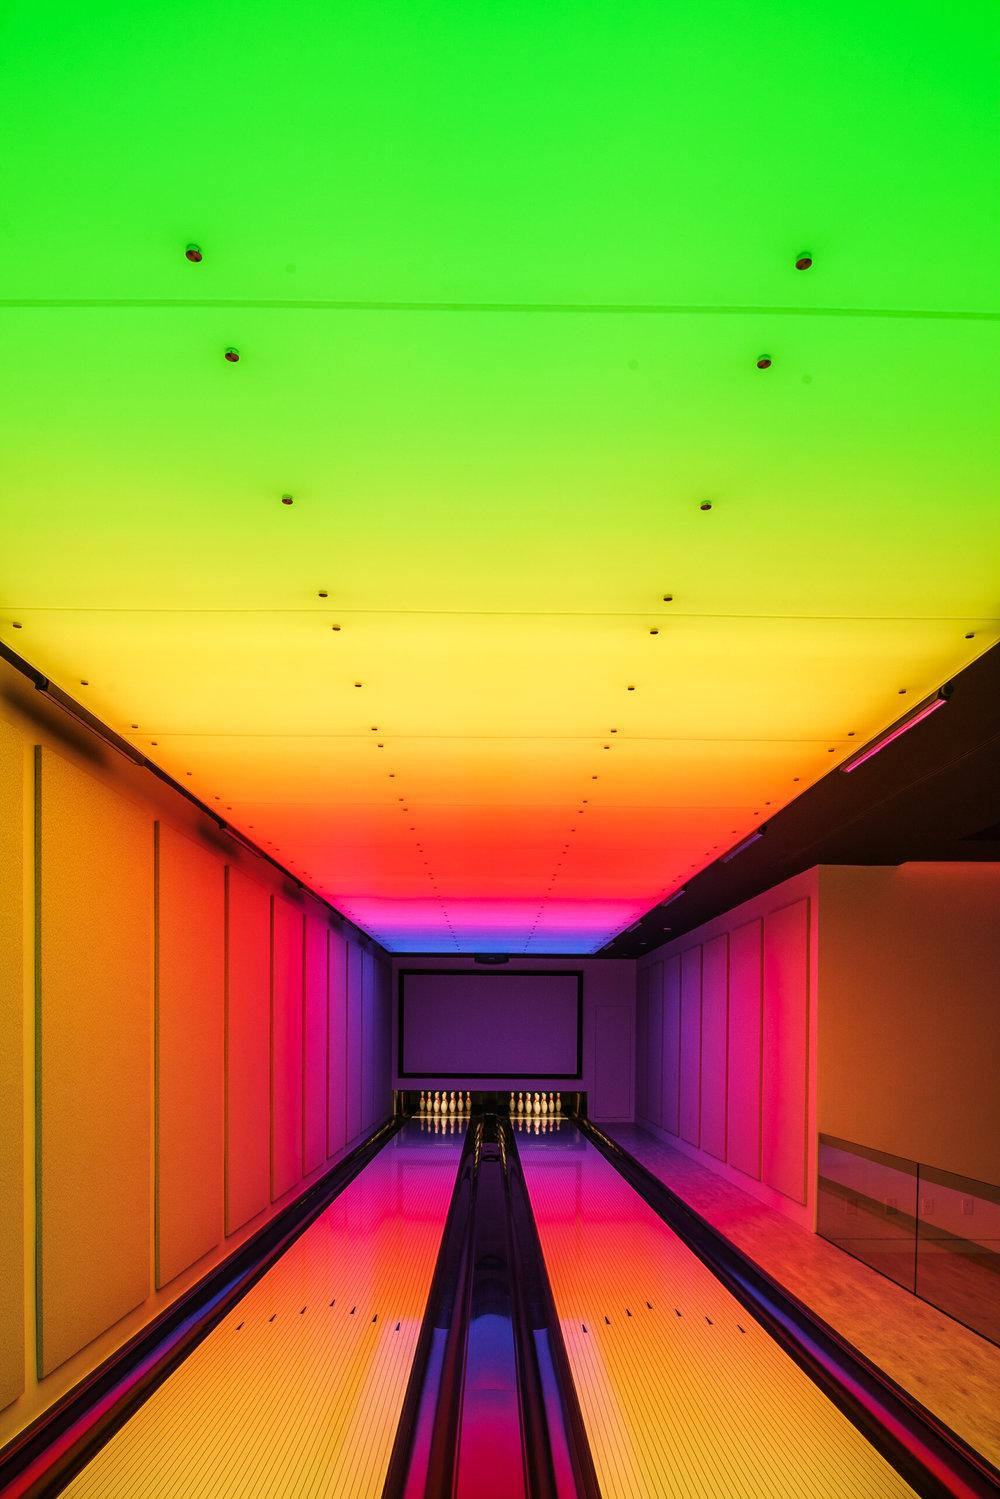 BAHAMAS GAME ROOM - Louise Muir Interiors - NassauOrsman Design (lighting) - NYC